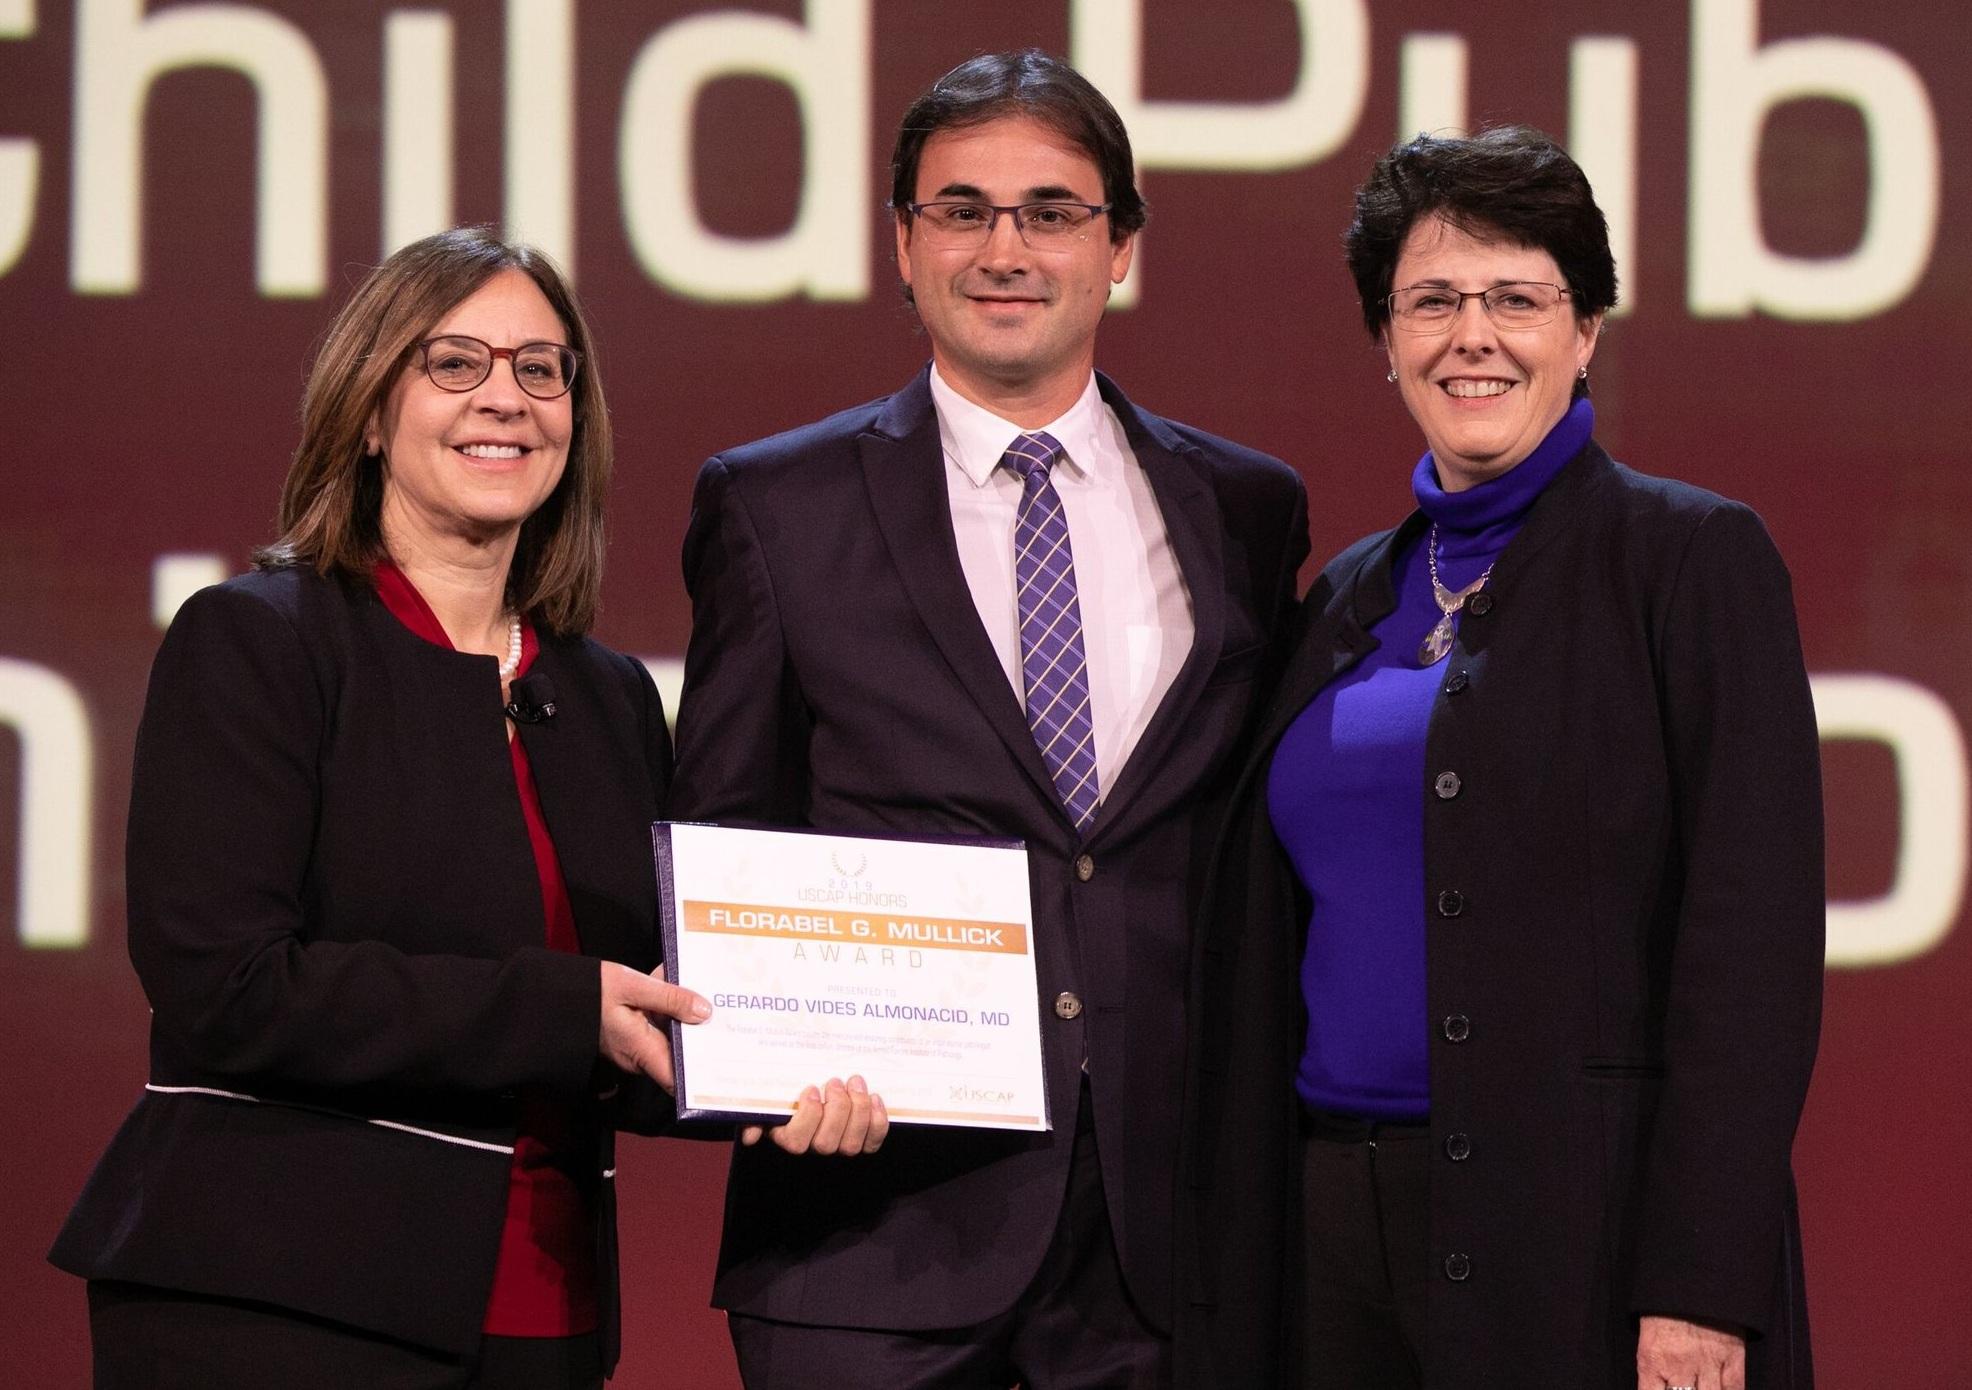 Gerardo Vides Almonacid, MD   2019 Awardee of the Florabel G. Mullick Award